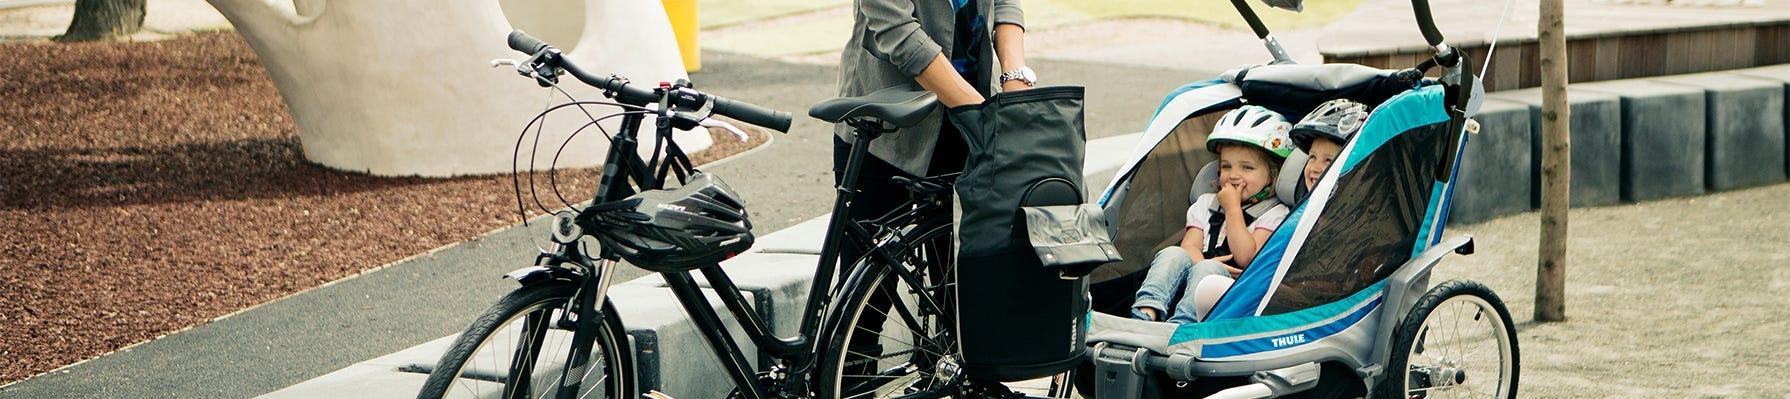 Bags Travel & Storage